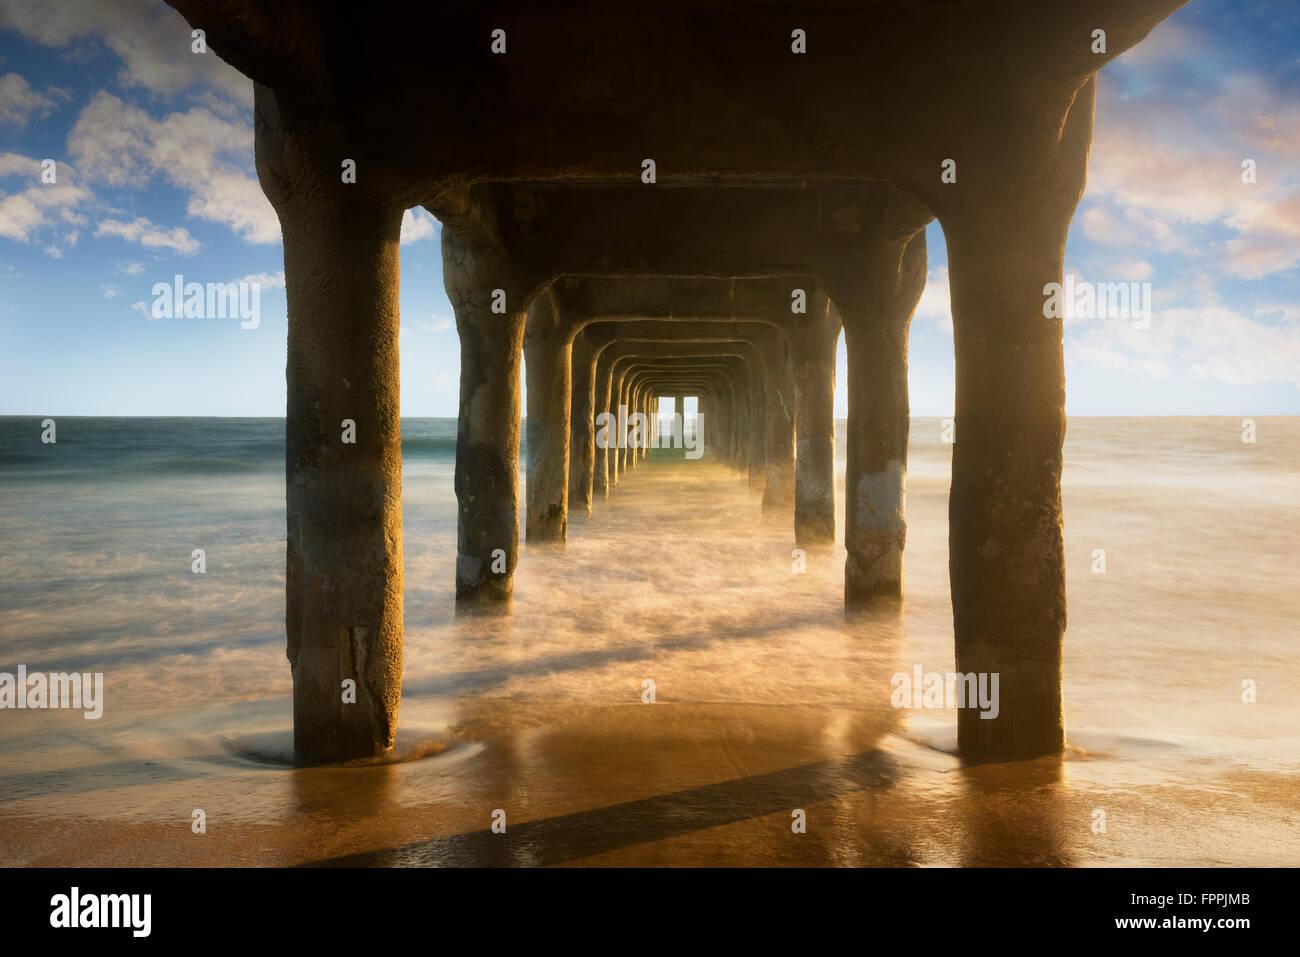 Manhattan Beach Pier at Sunset. Manhattan Beach, California - Stock Image